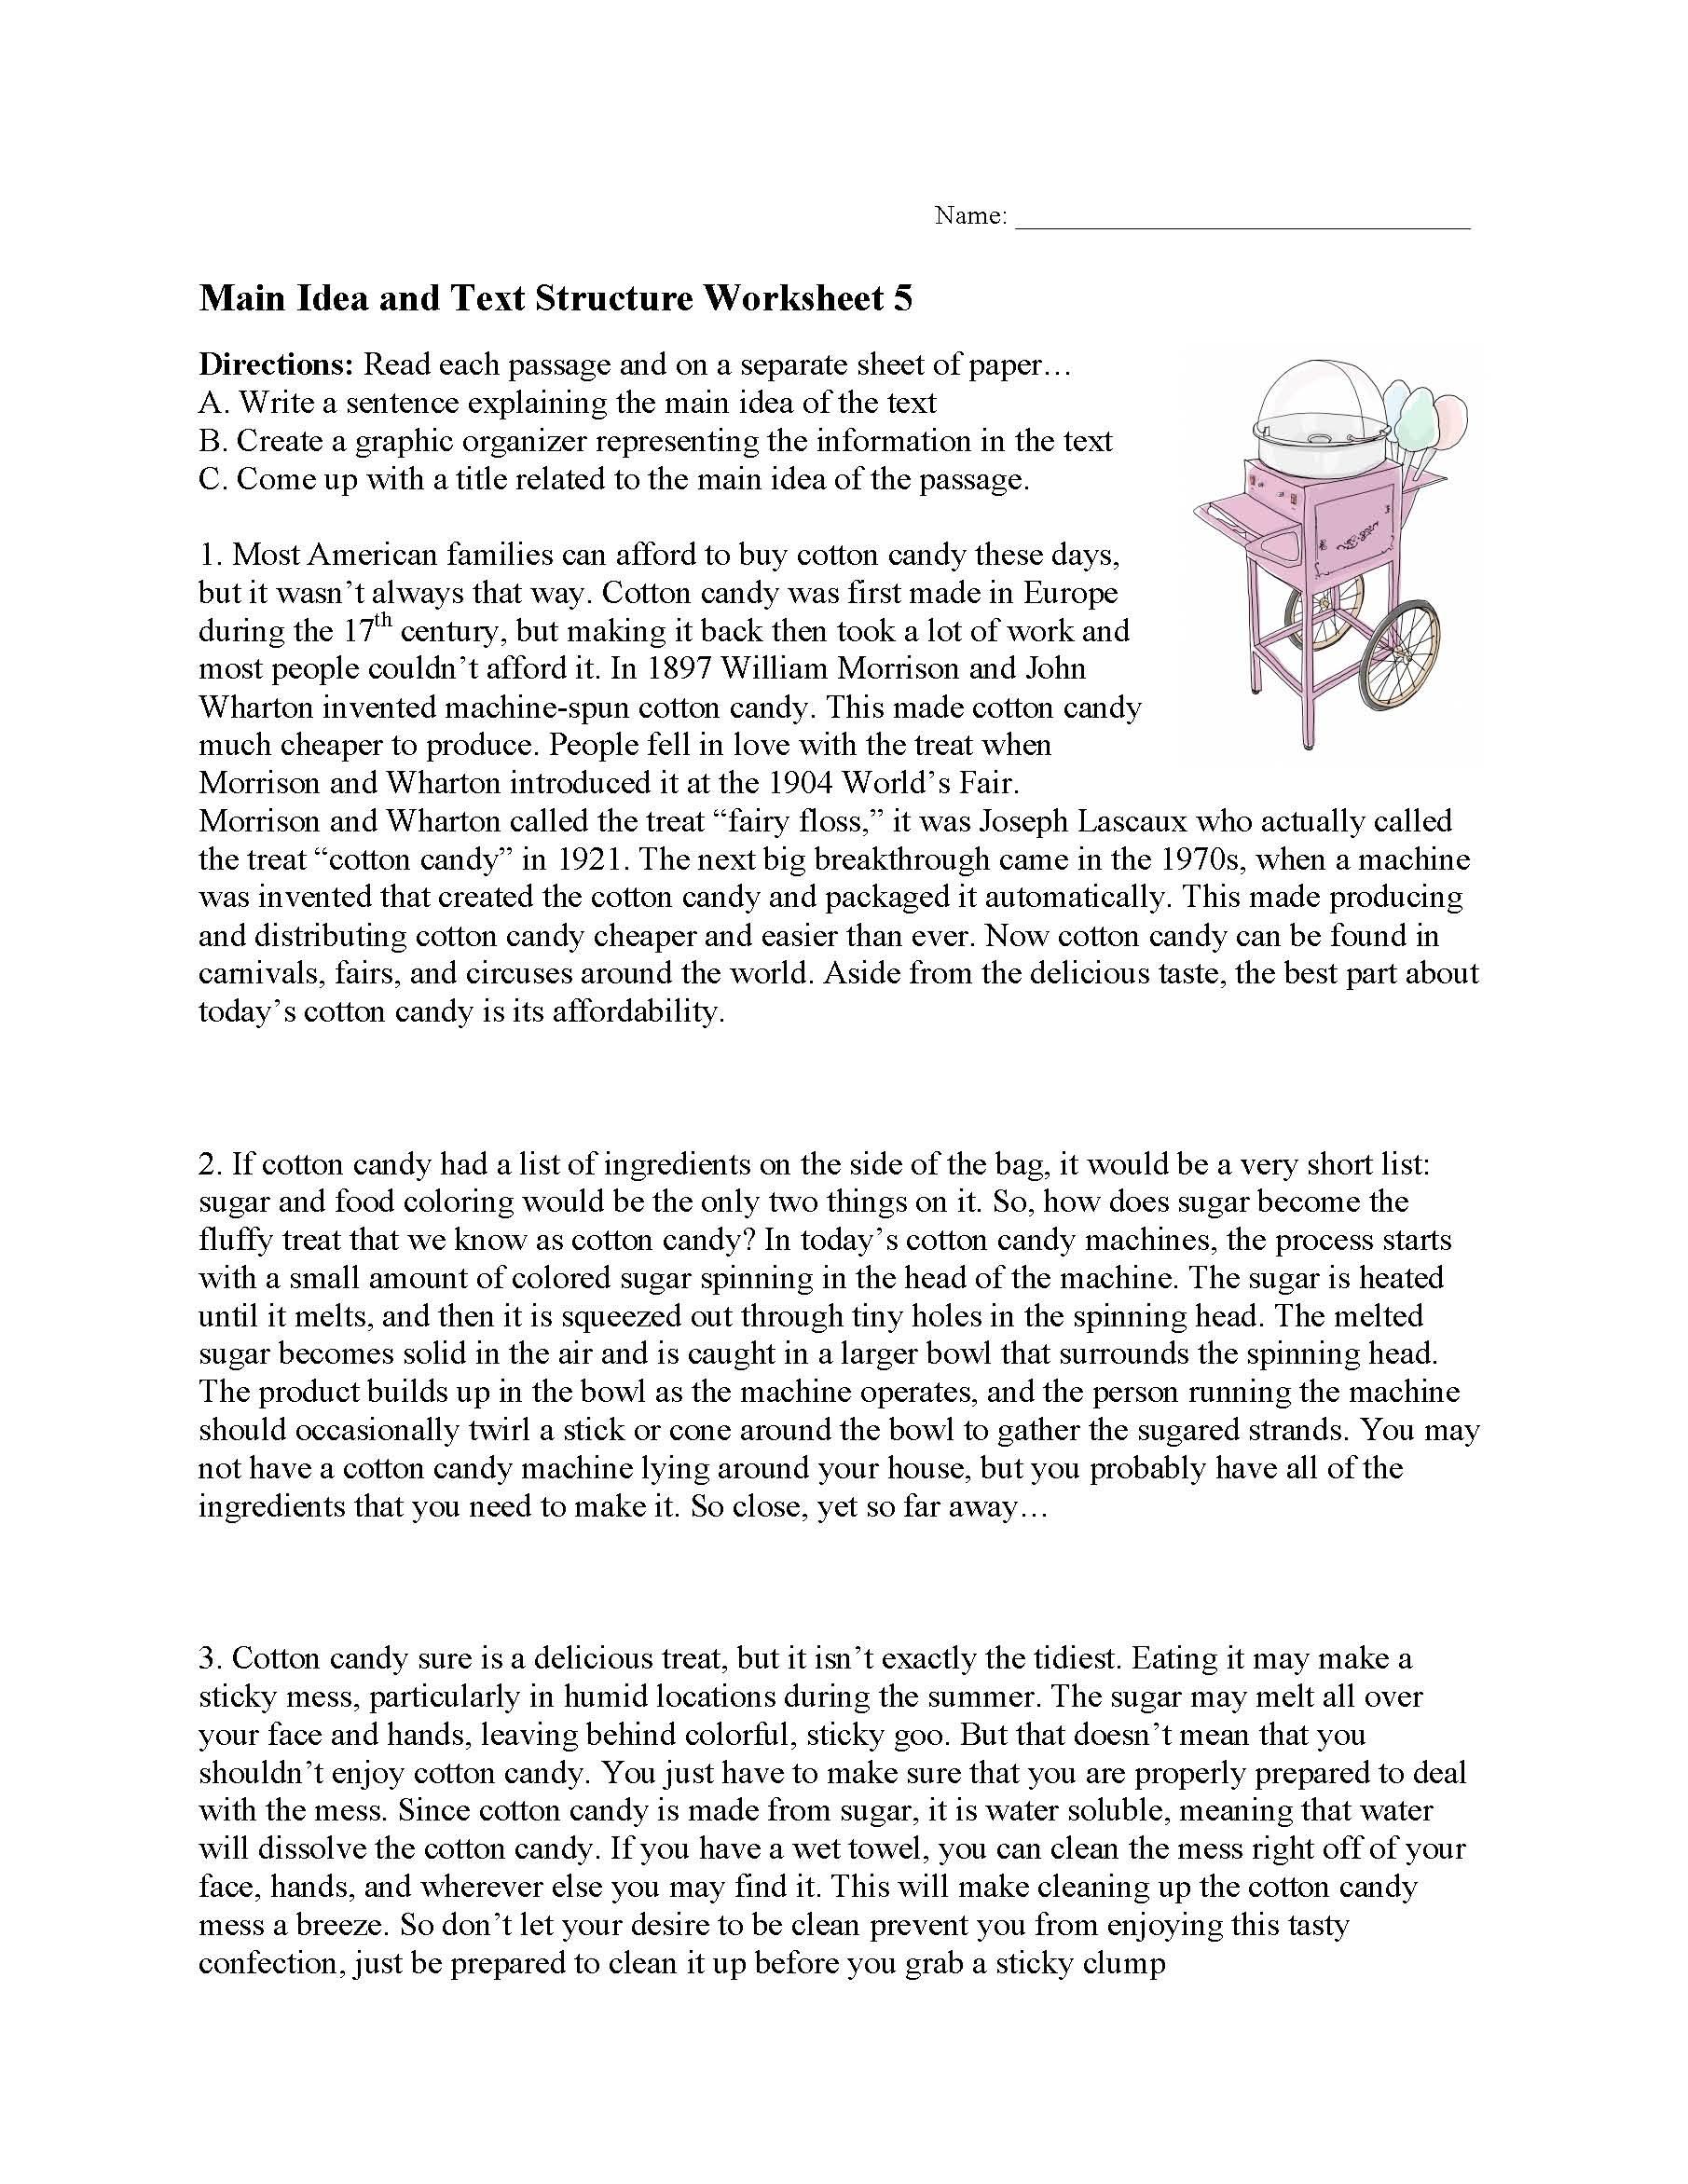 31 Main Idea Worksheet 5